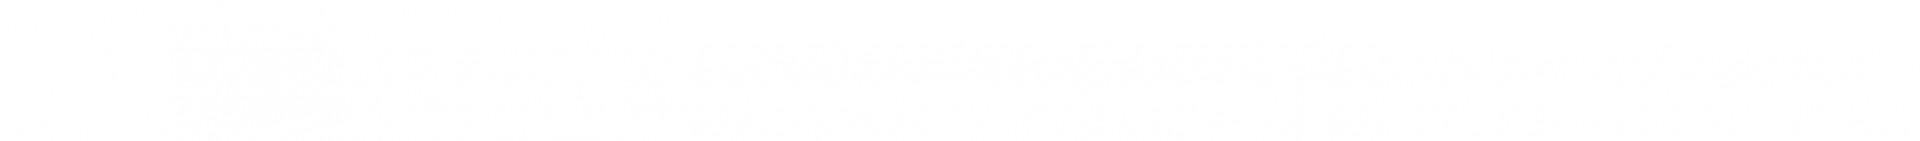 cropped-logo-yessicart-weiss-012.jpg